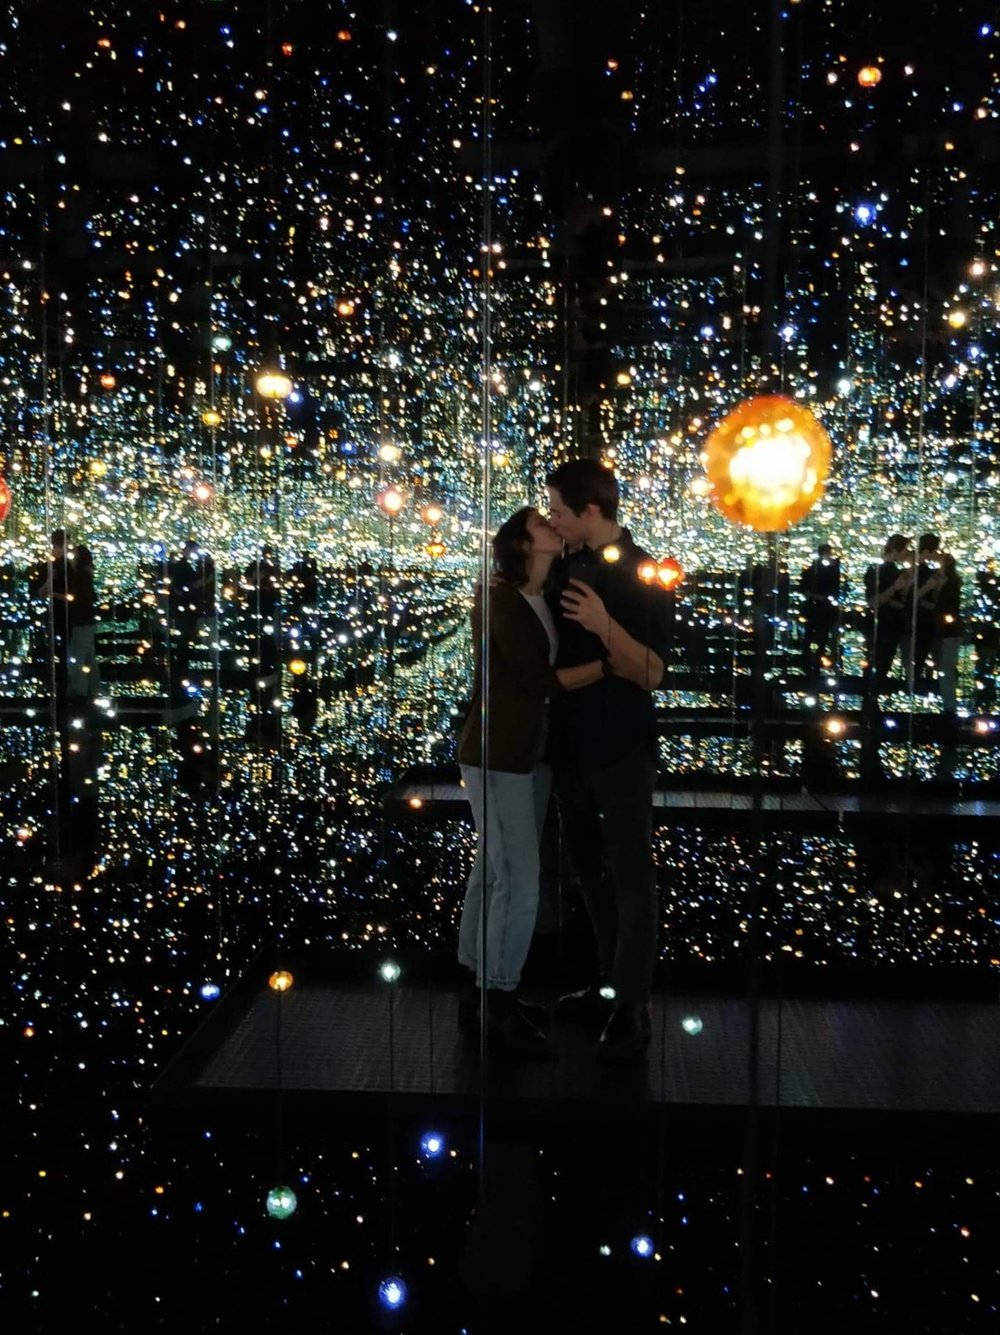 Yayoi Kusama's Infinity Mirrors